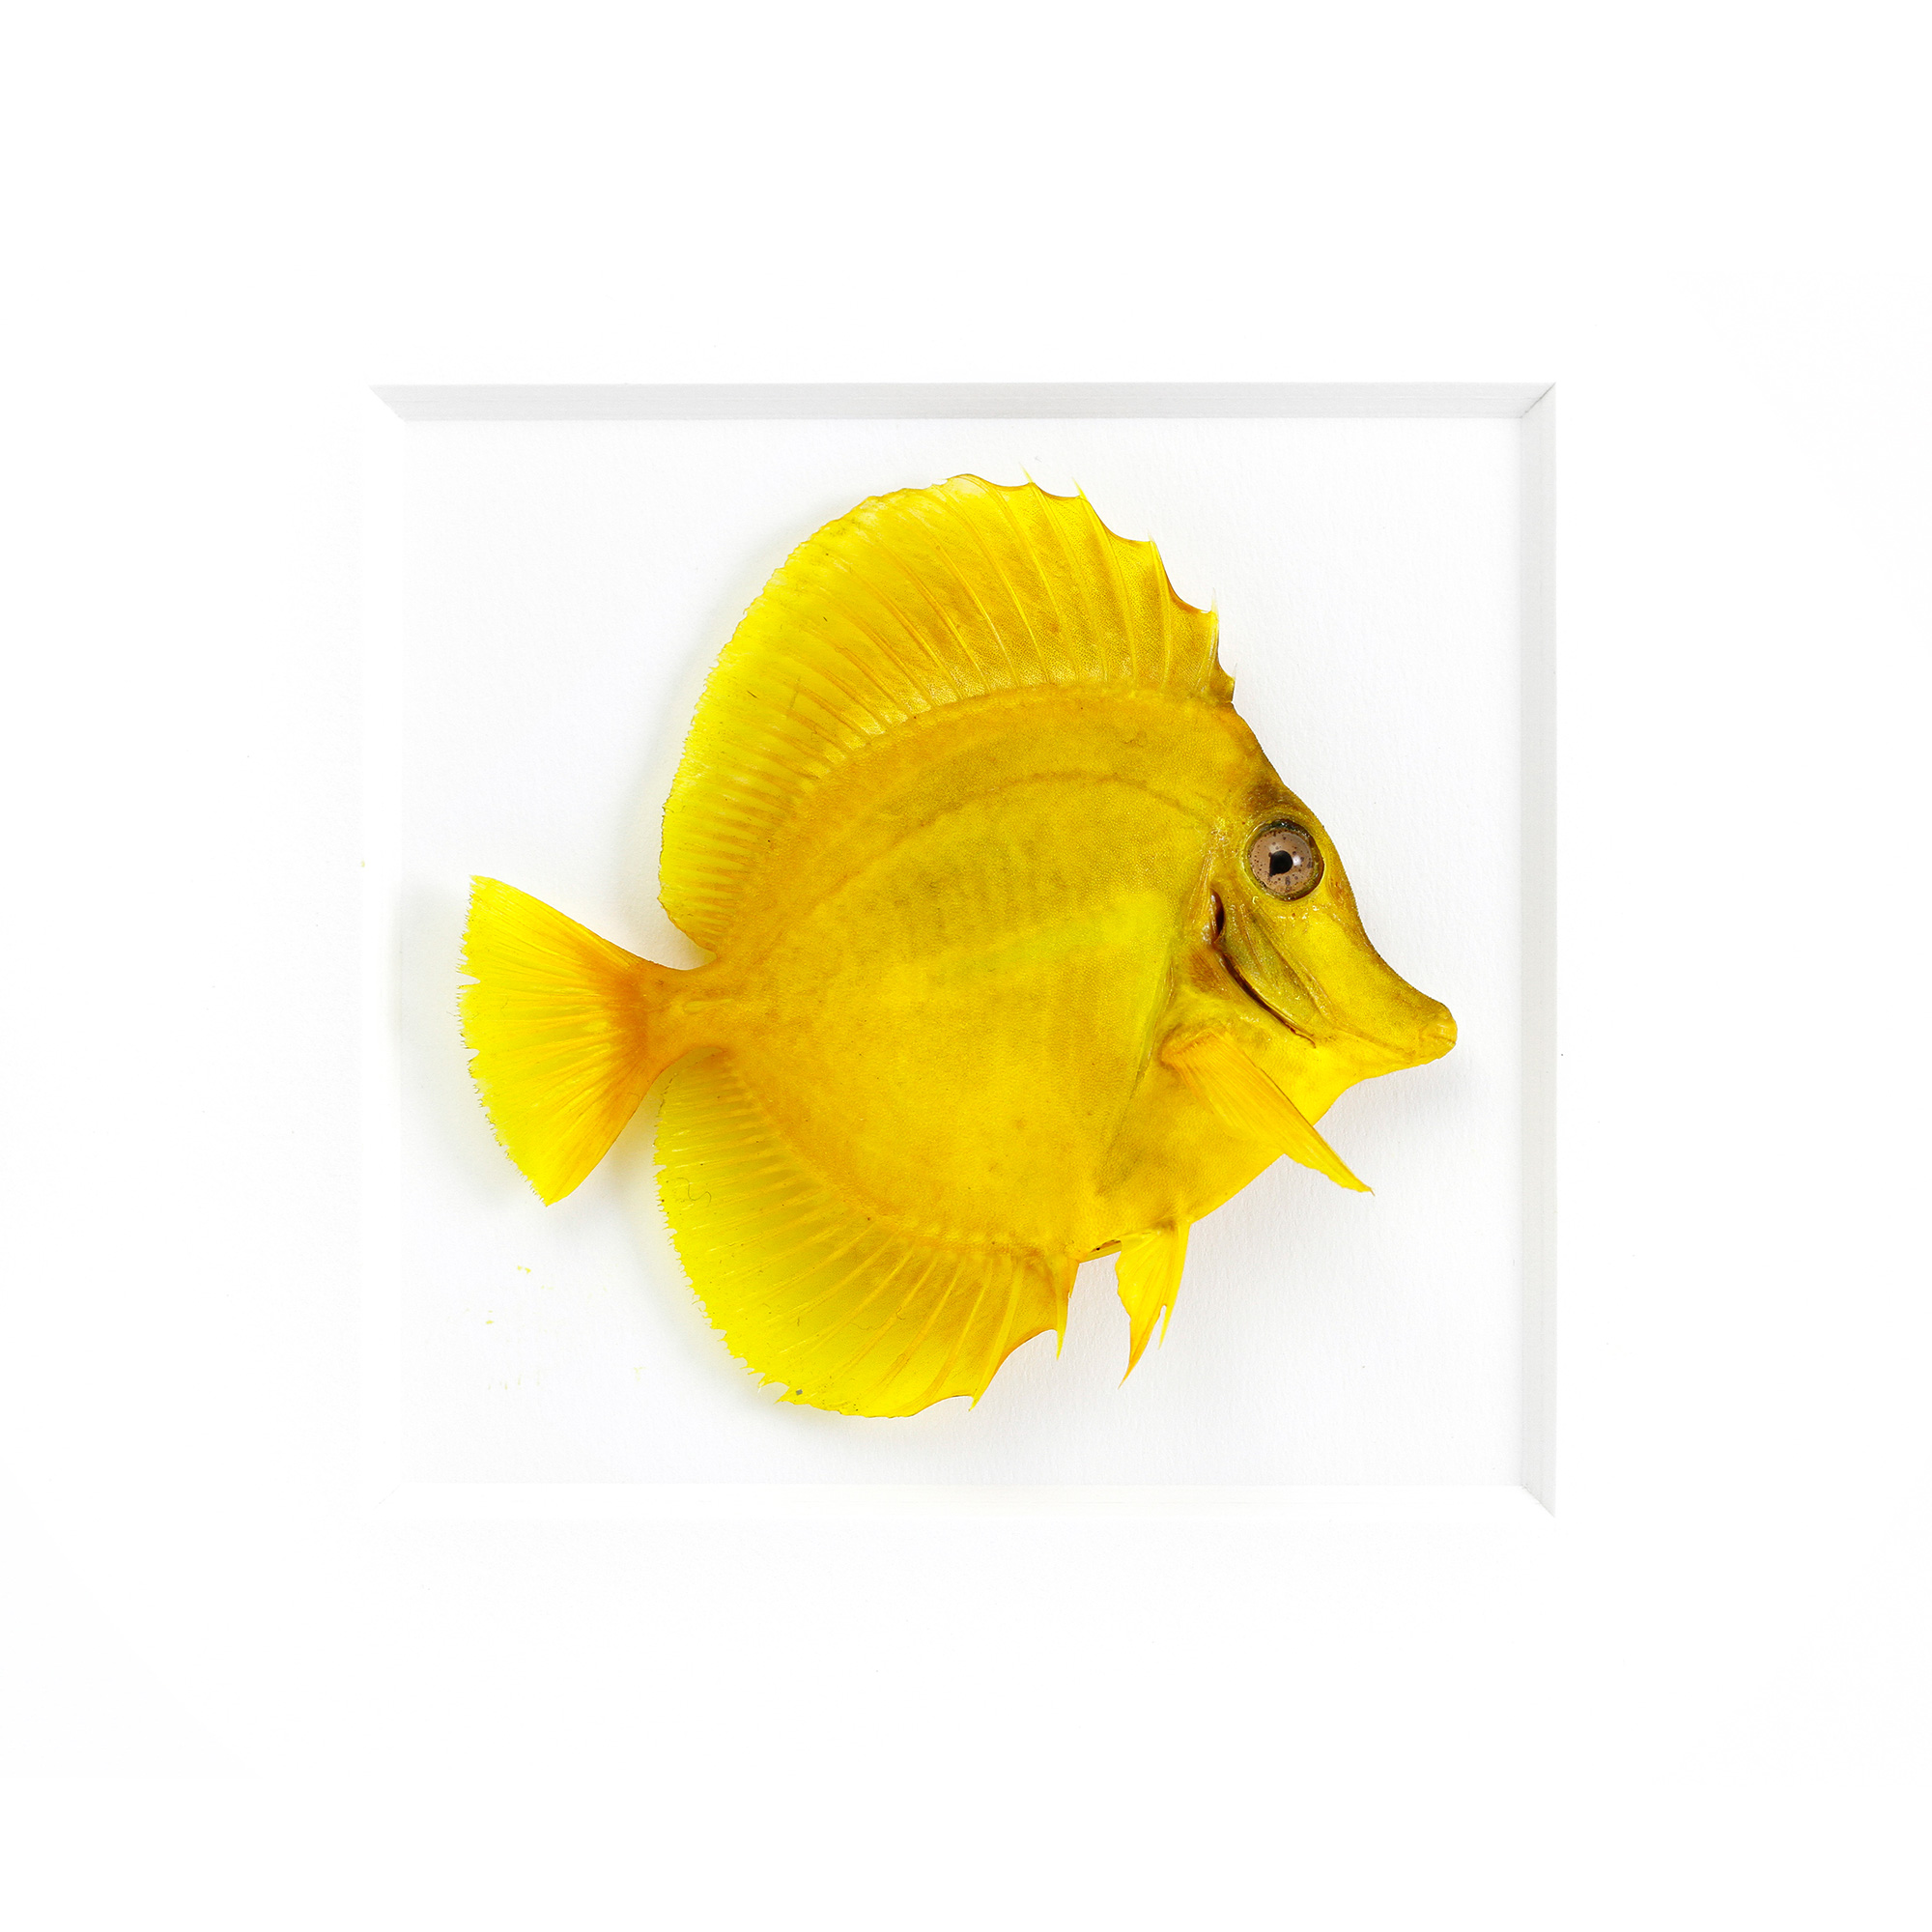 11 x 14 yellow tang fish house of whitley for Yellow tang fish